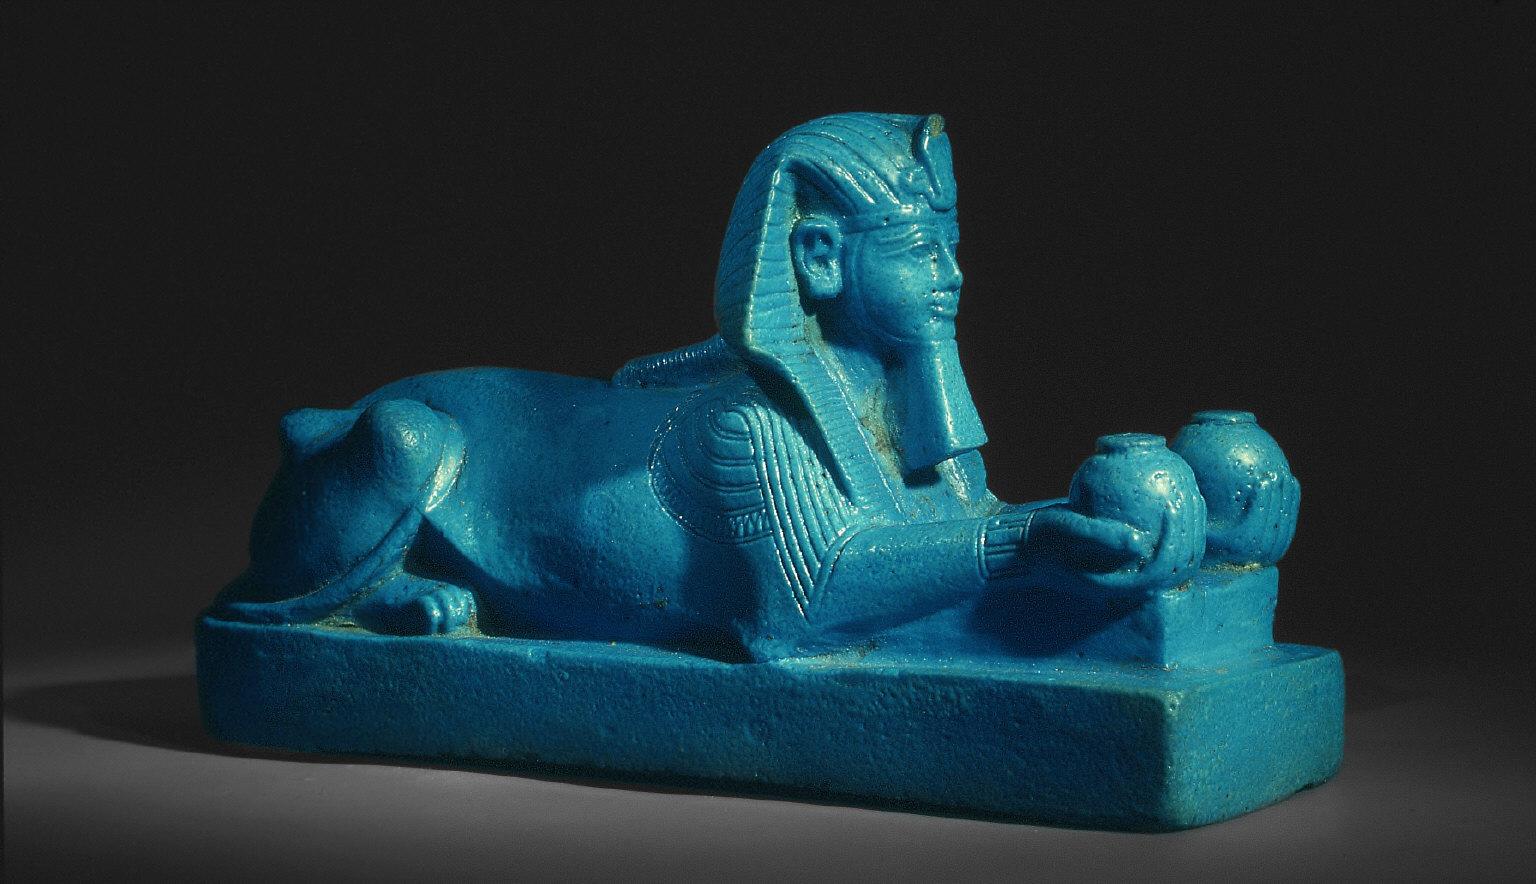 Sphinx of Amenhotep III